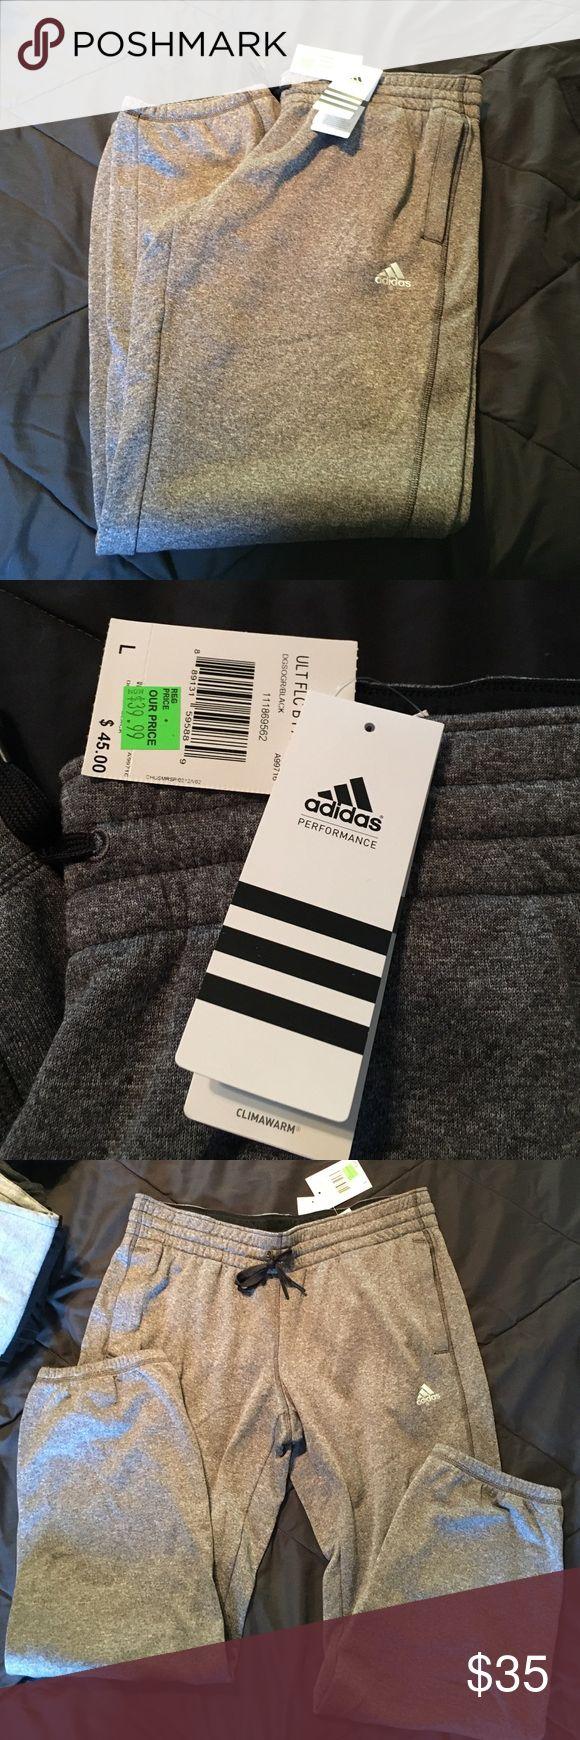 Adidas grey fleece jogger pants size large Adidas grey fleece jogger pants size large. NWT. Never worn. Pockets on both sides. Elastic waist with ties. And elastic at bottom of pant. Adidas Pants